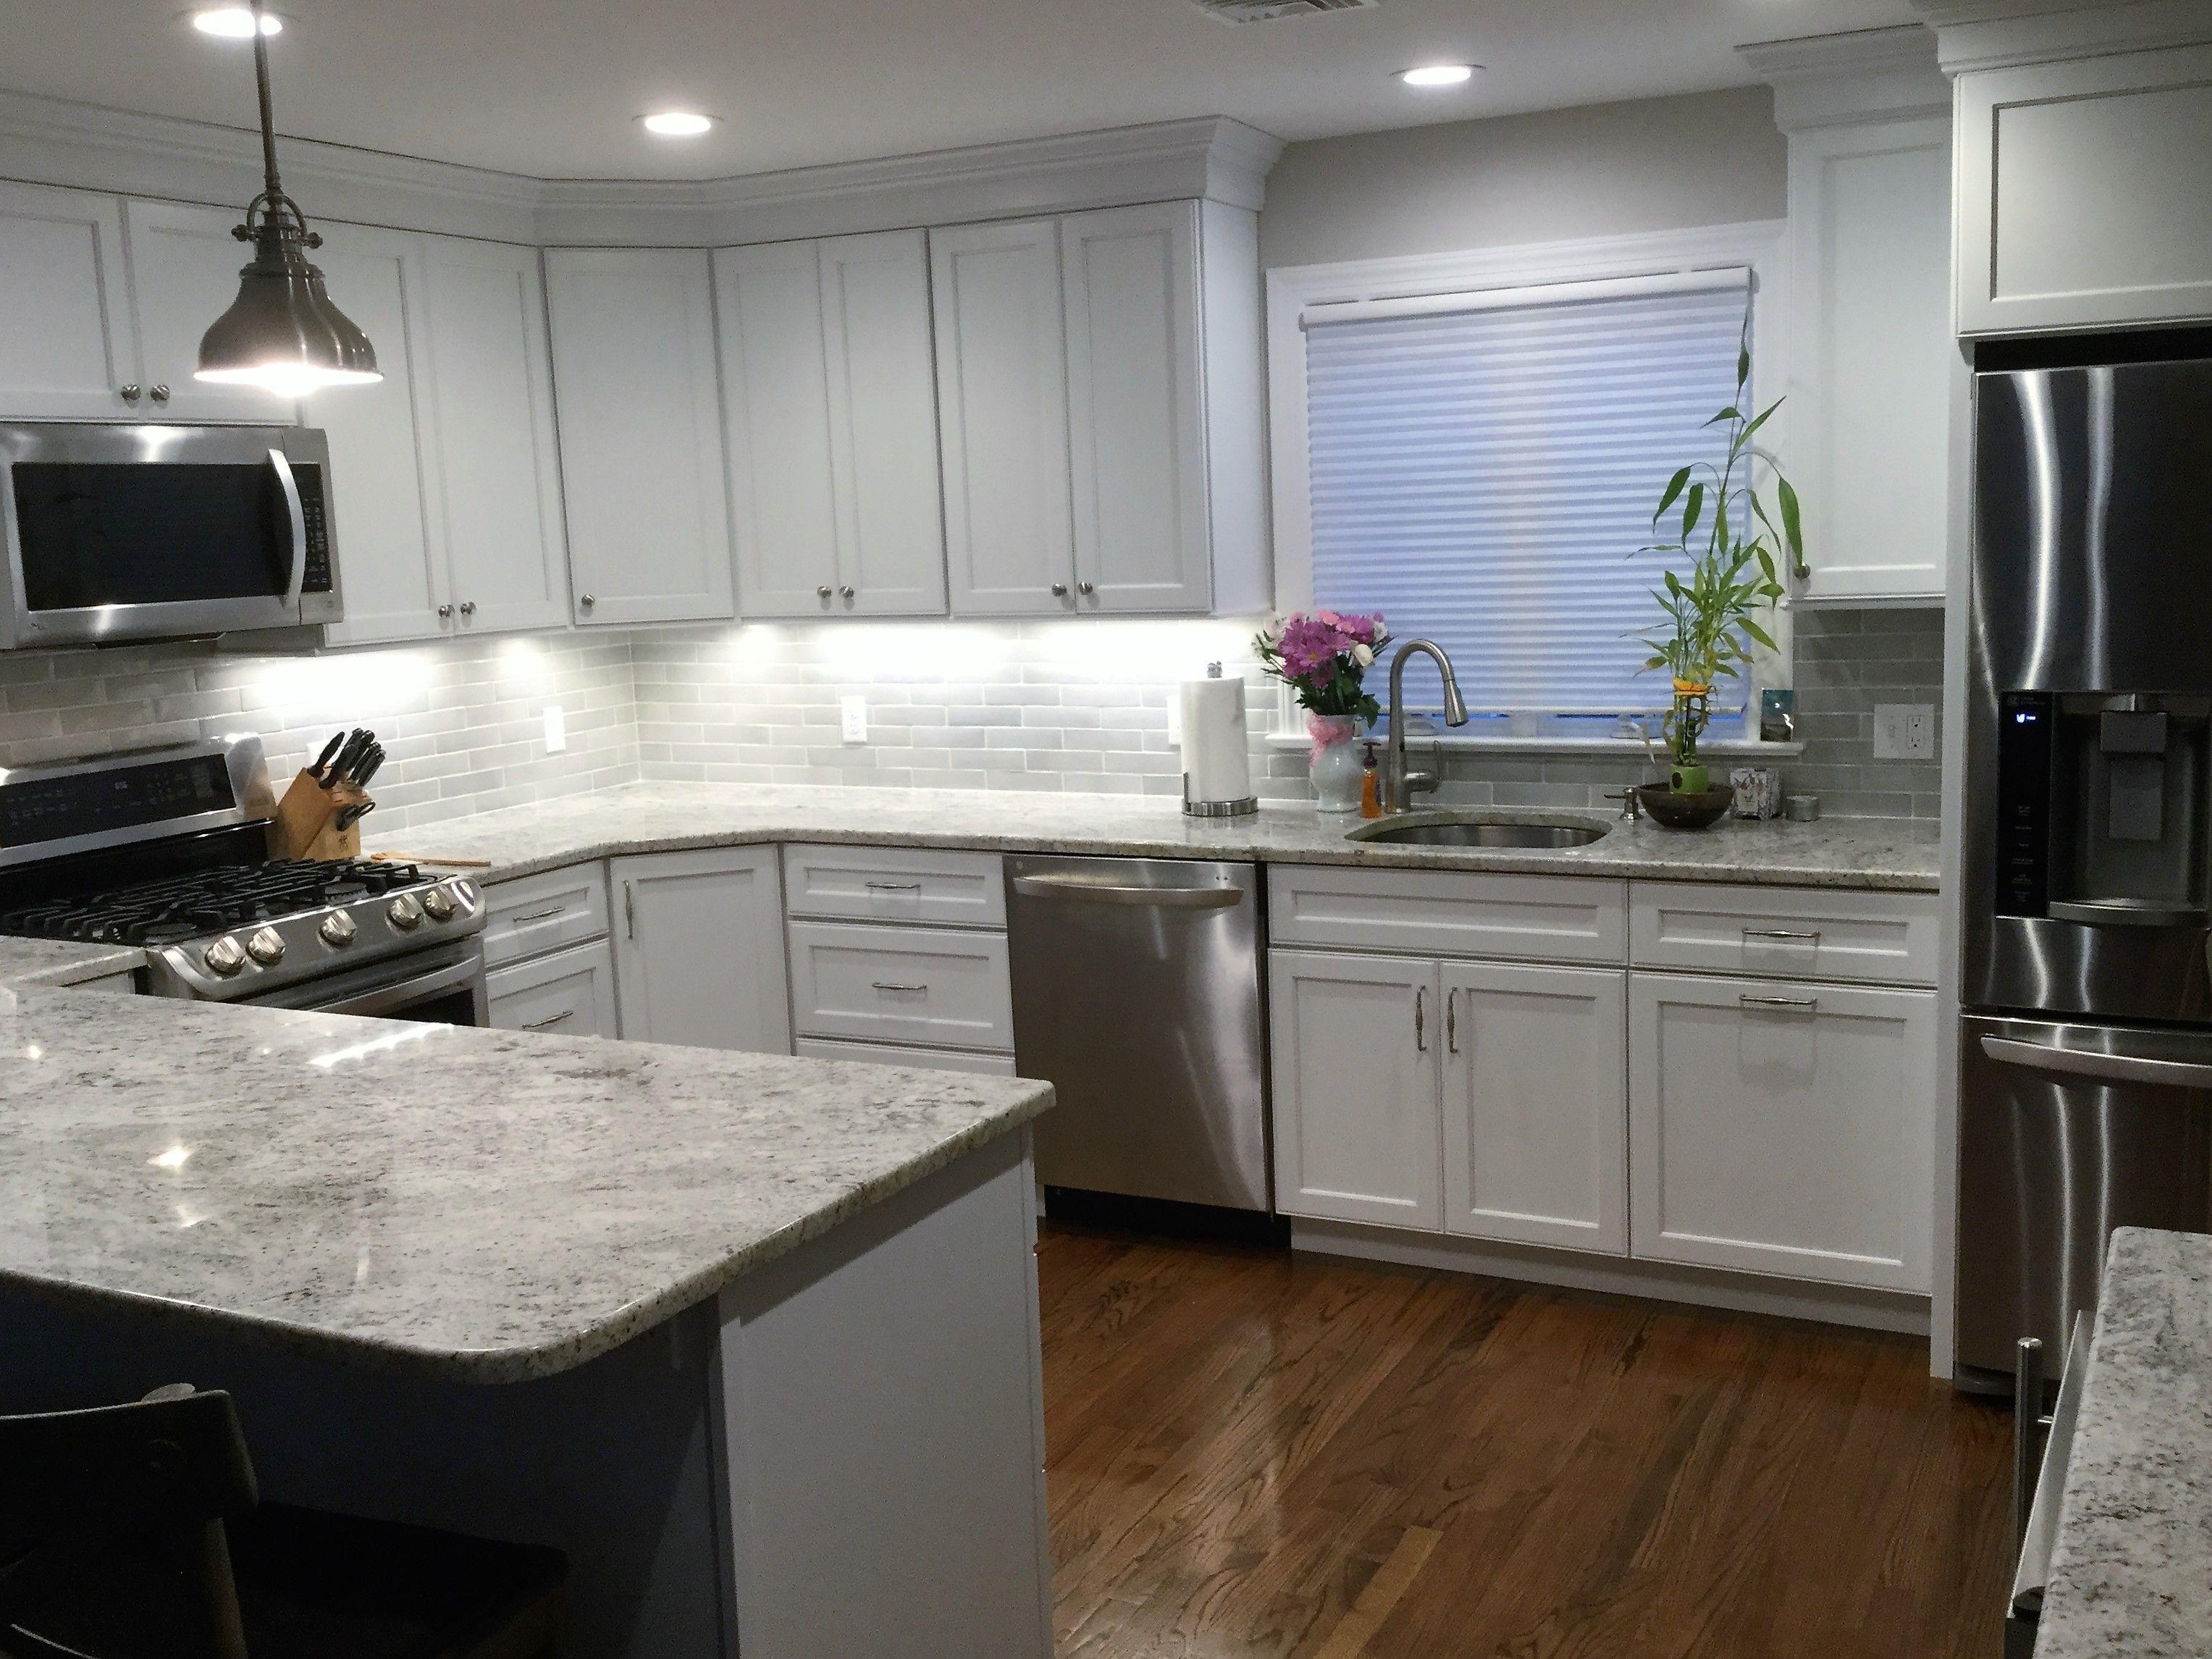 Grey Subway Tile Backsplash In White Kitchen Balboa Mist Benjamin Moore Wall Color